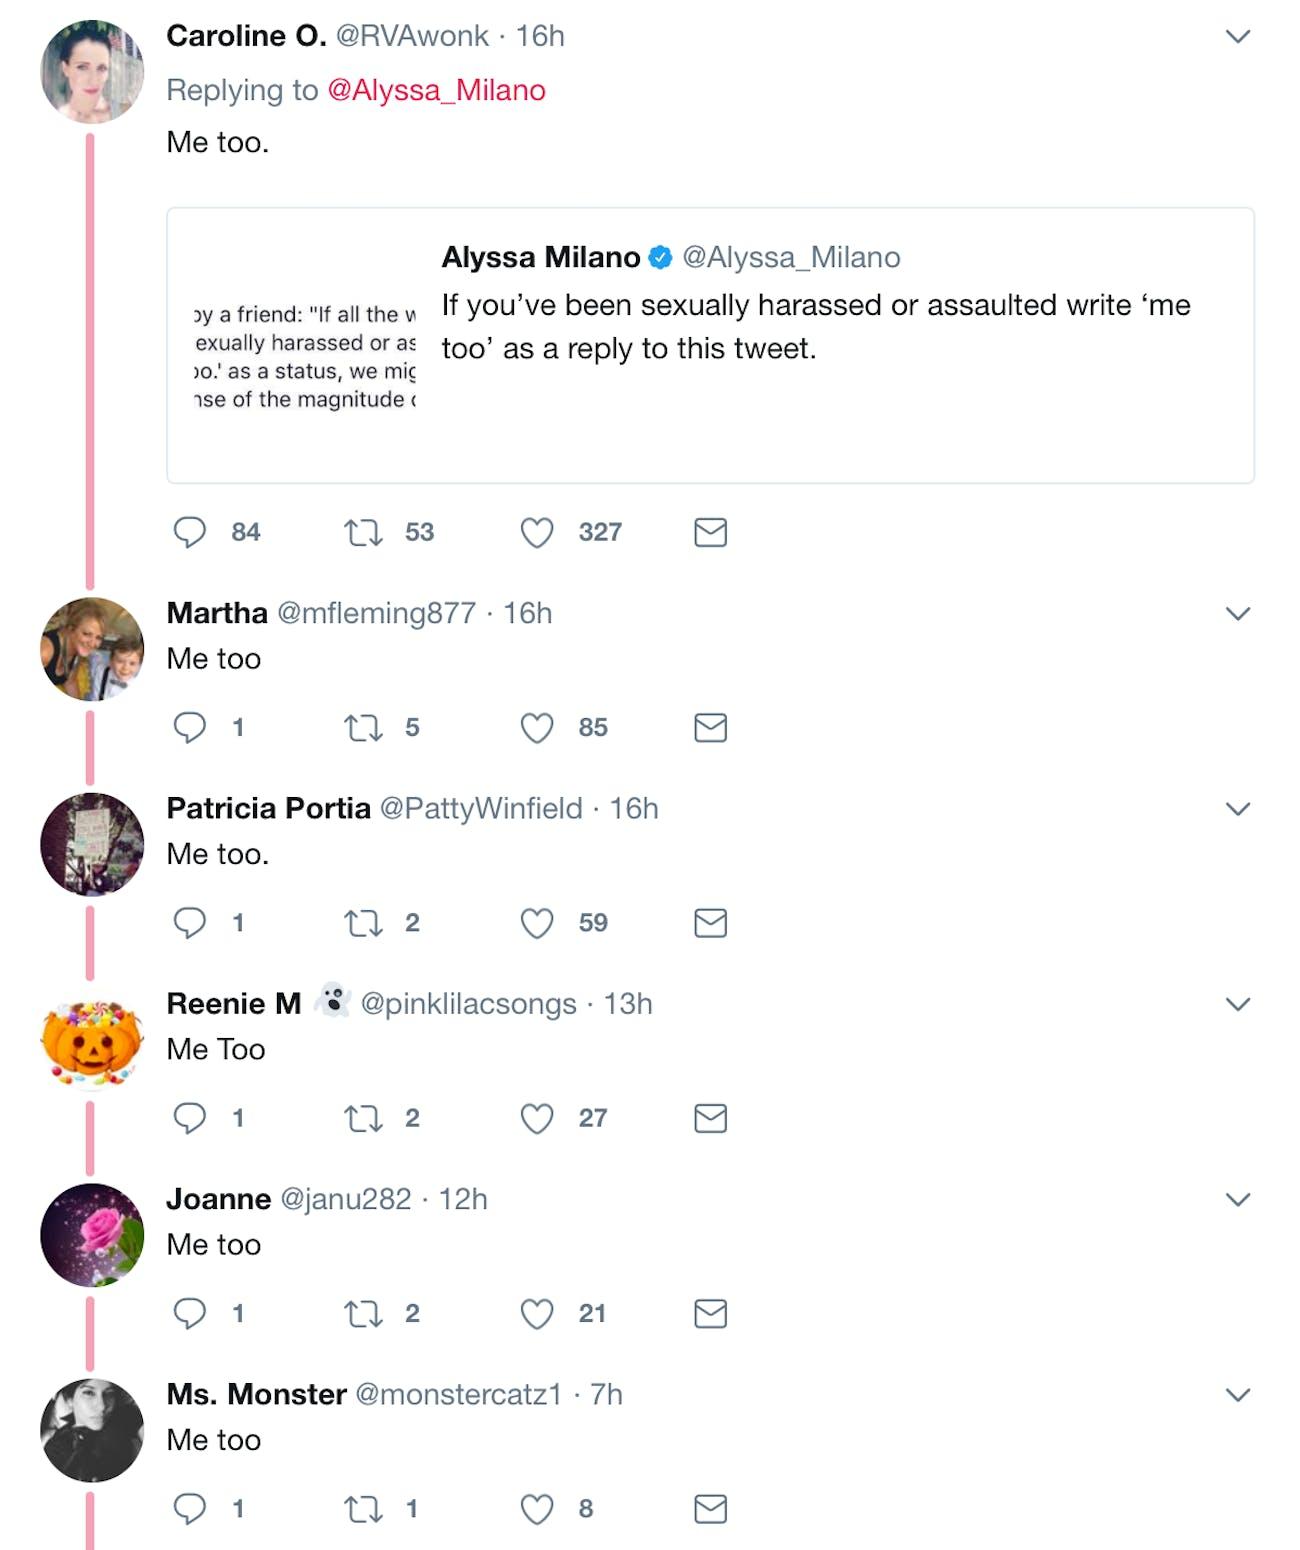 Replies to Milano's tweet.